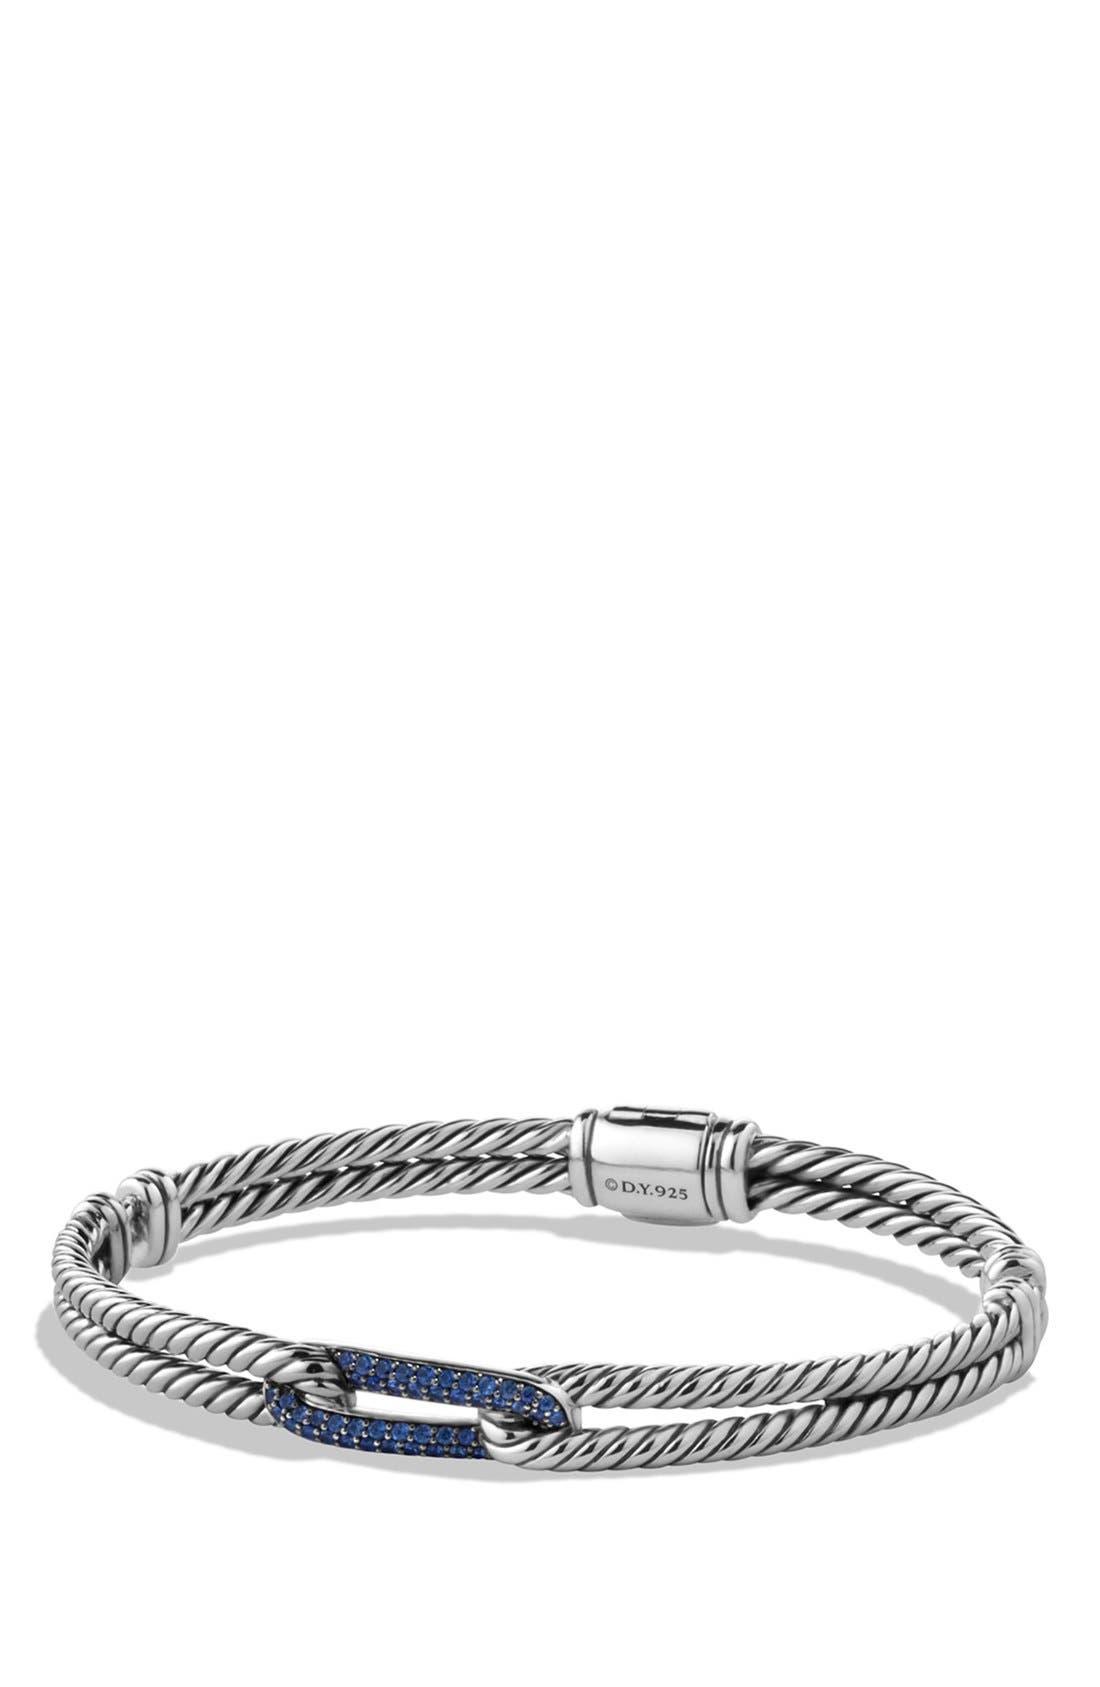 Main Image - David Yurman 'Labyrinth' Petite Pavé Single-Loop Bracelet with Sapphires